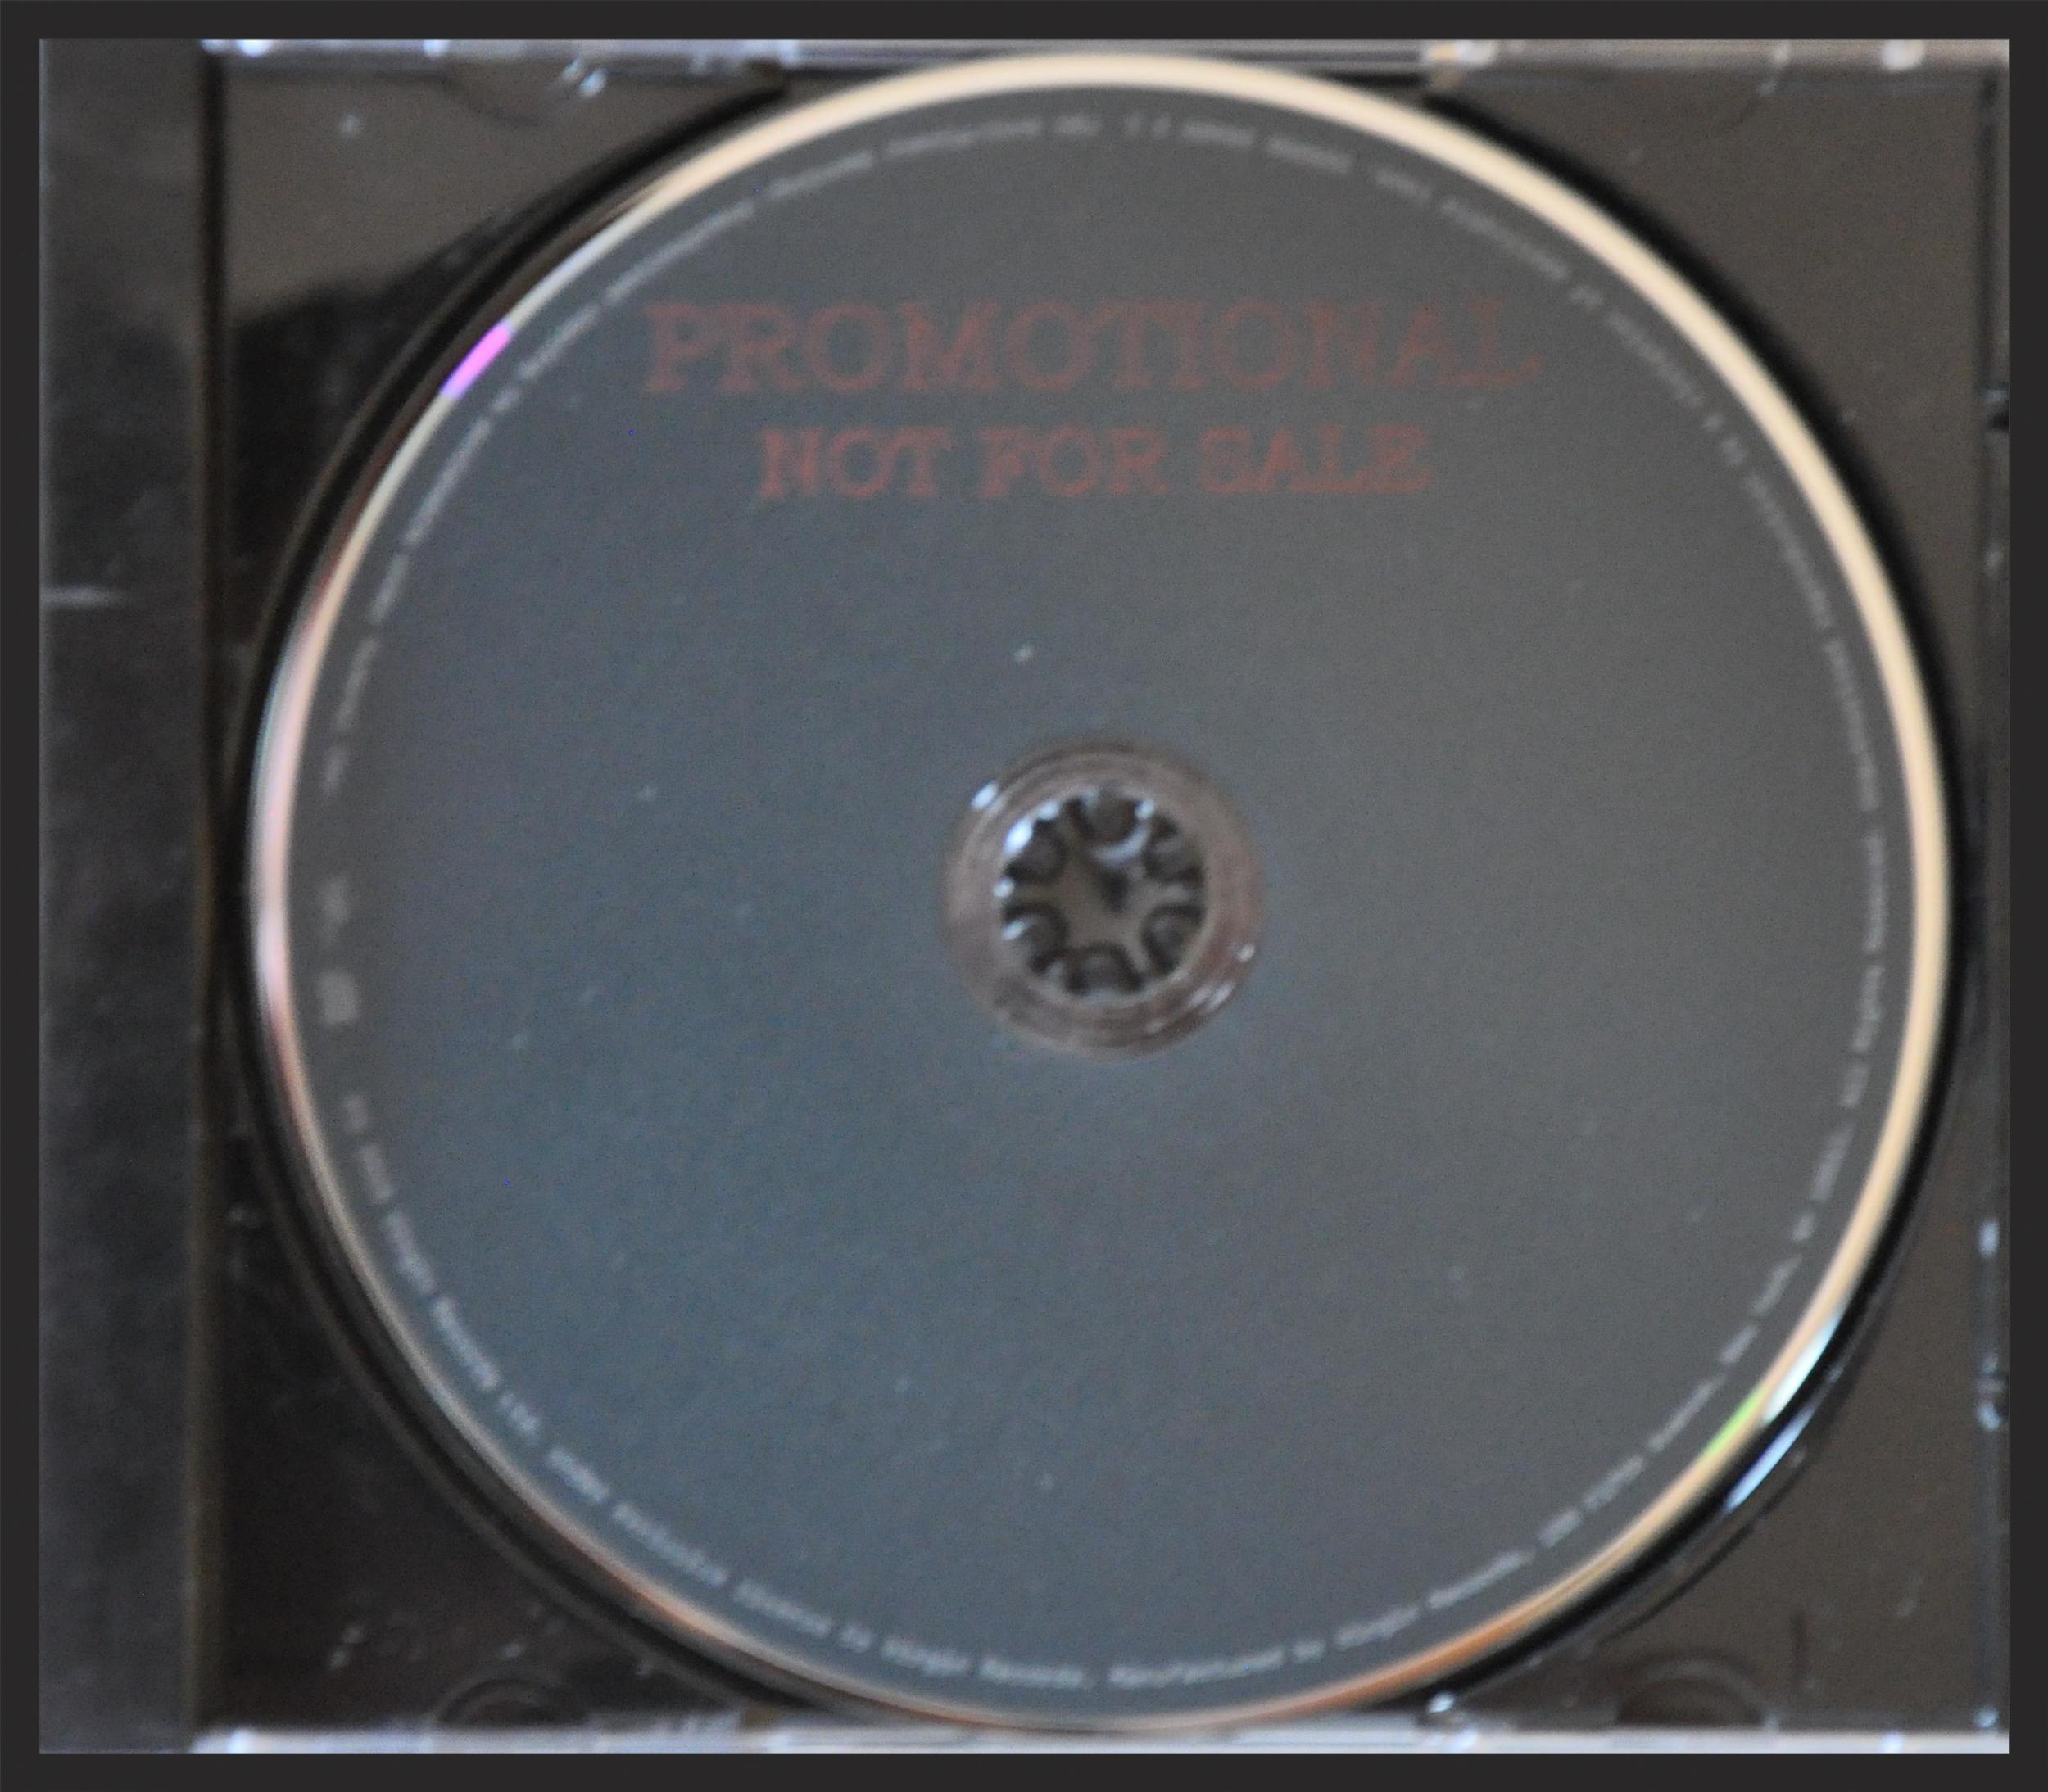 usapromocd-1304339199.jpg